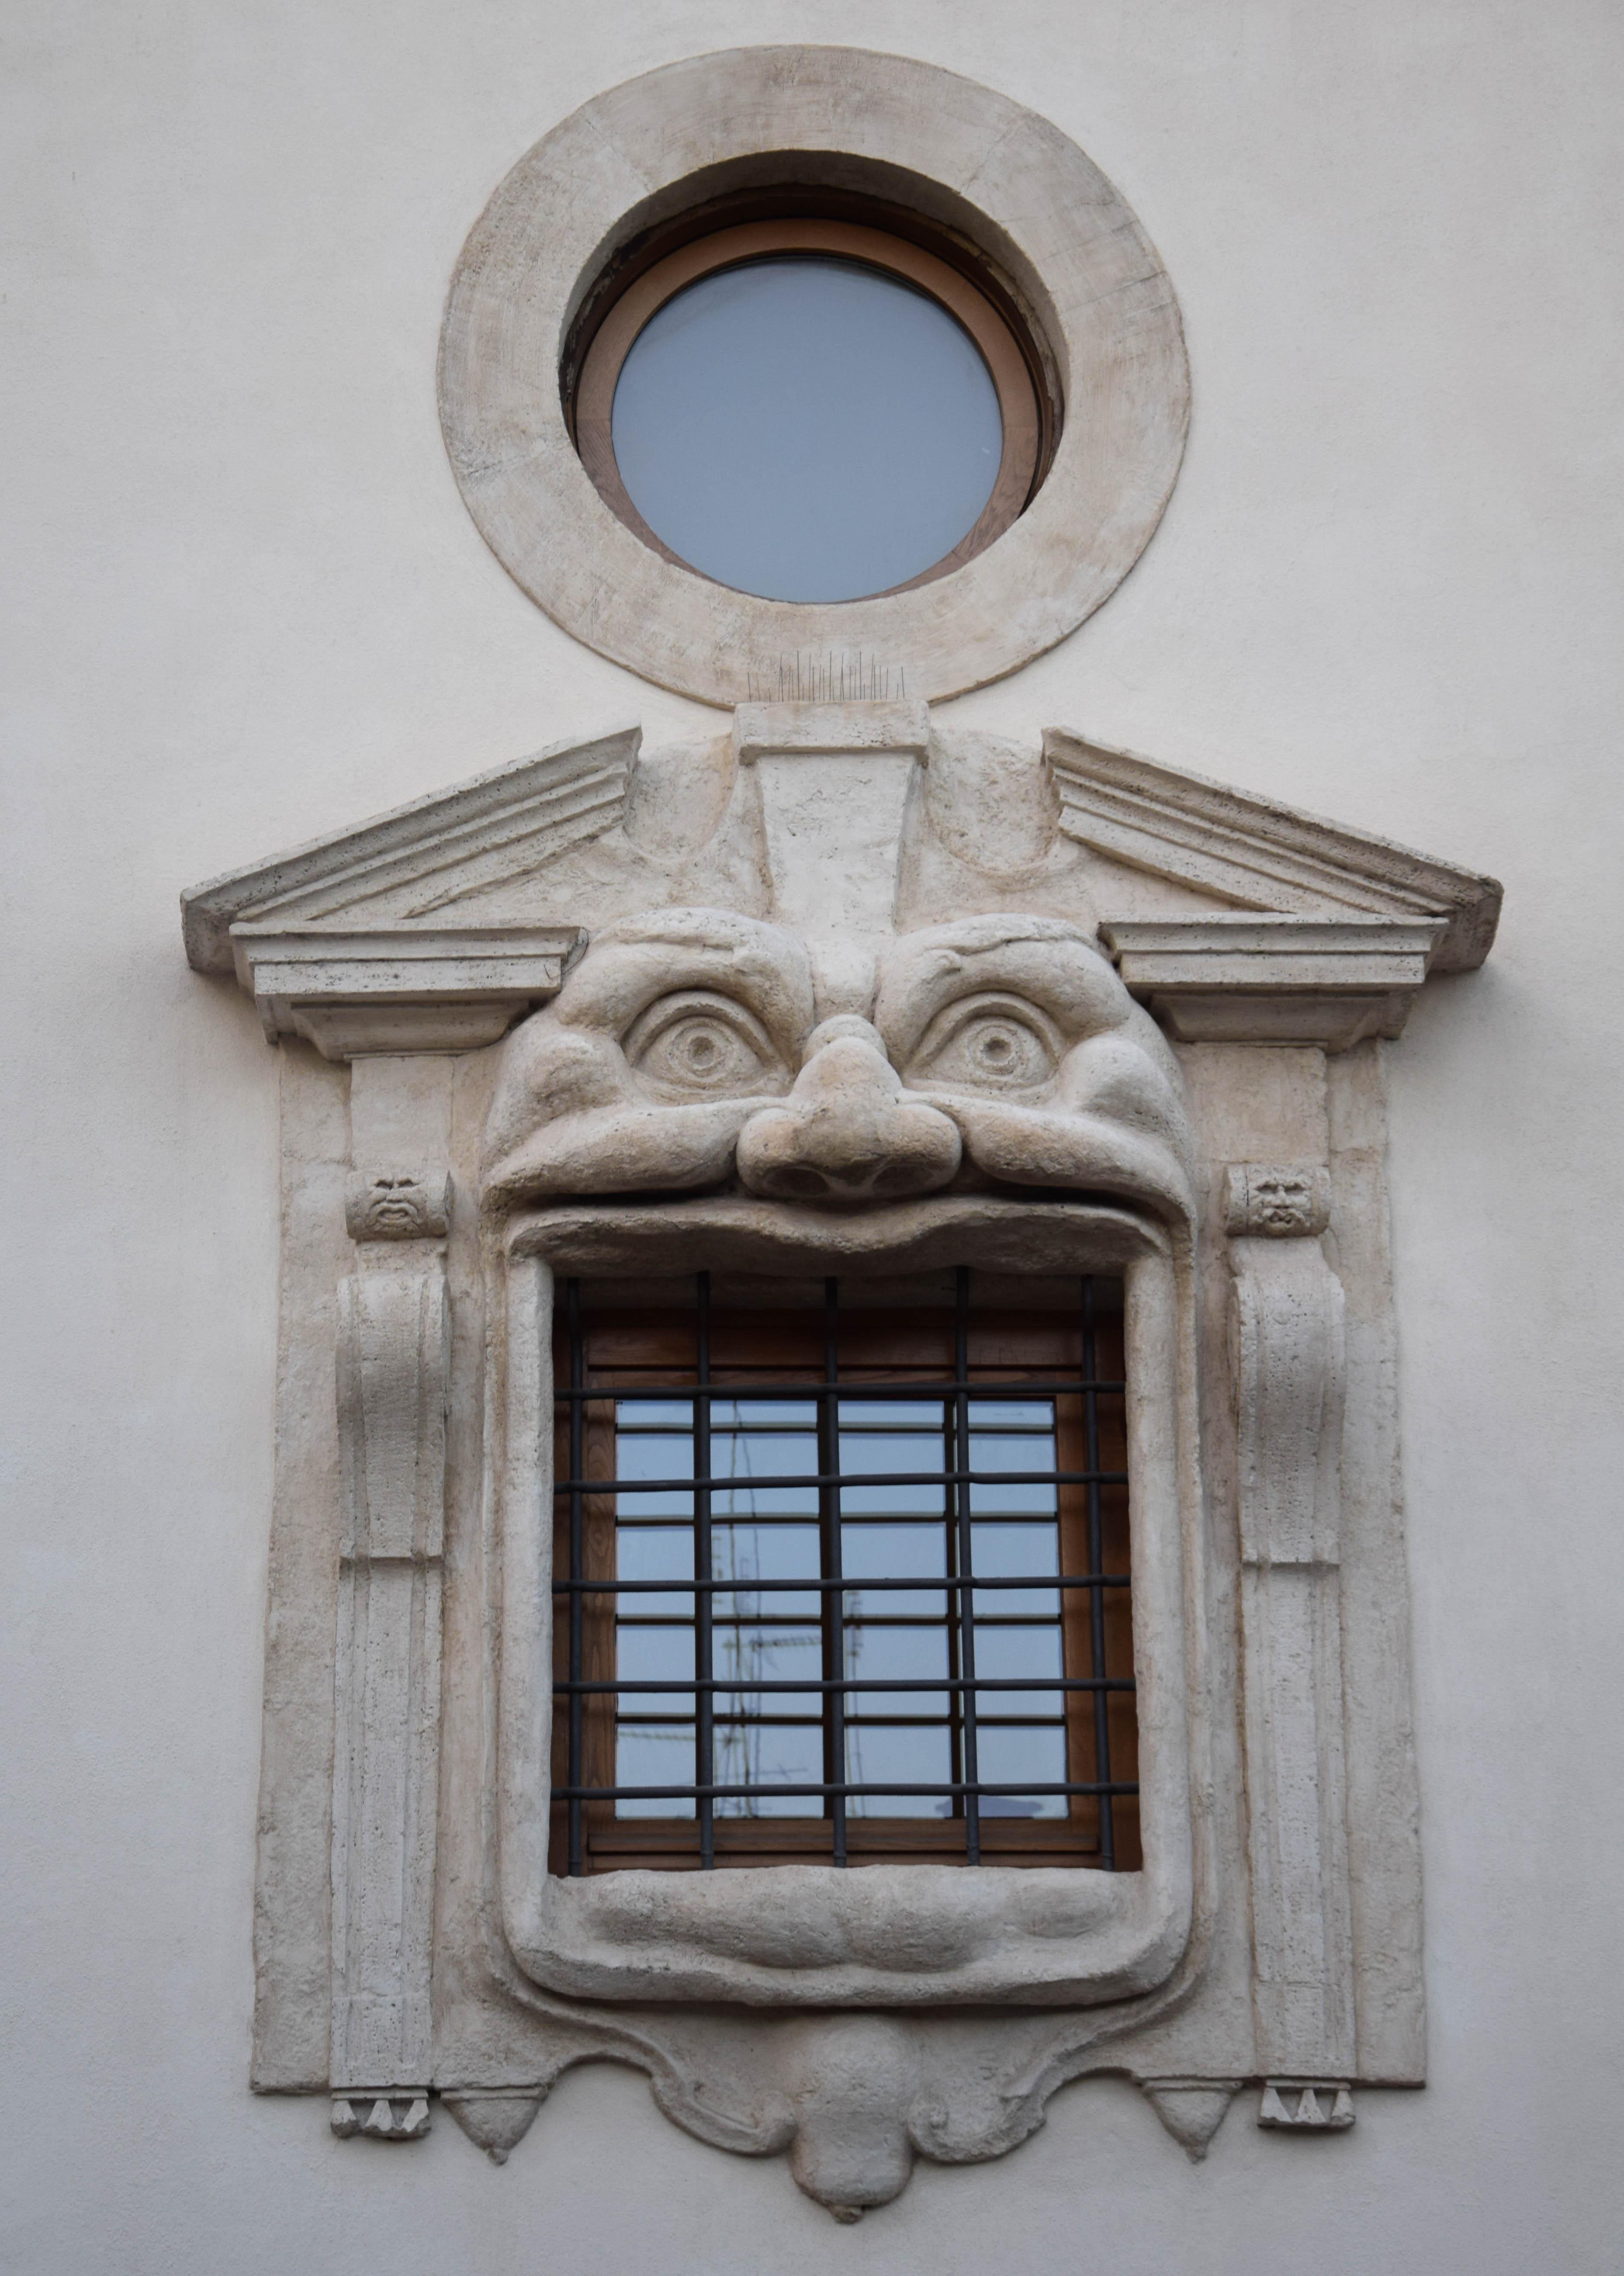 Fondos de pantalla : ventana, Italia, arquitectura, antiguo, madera ...